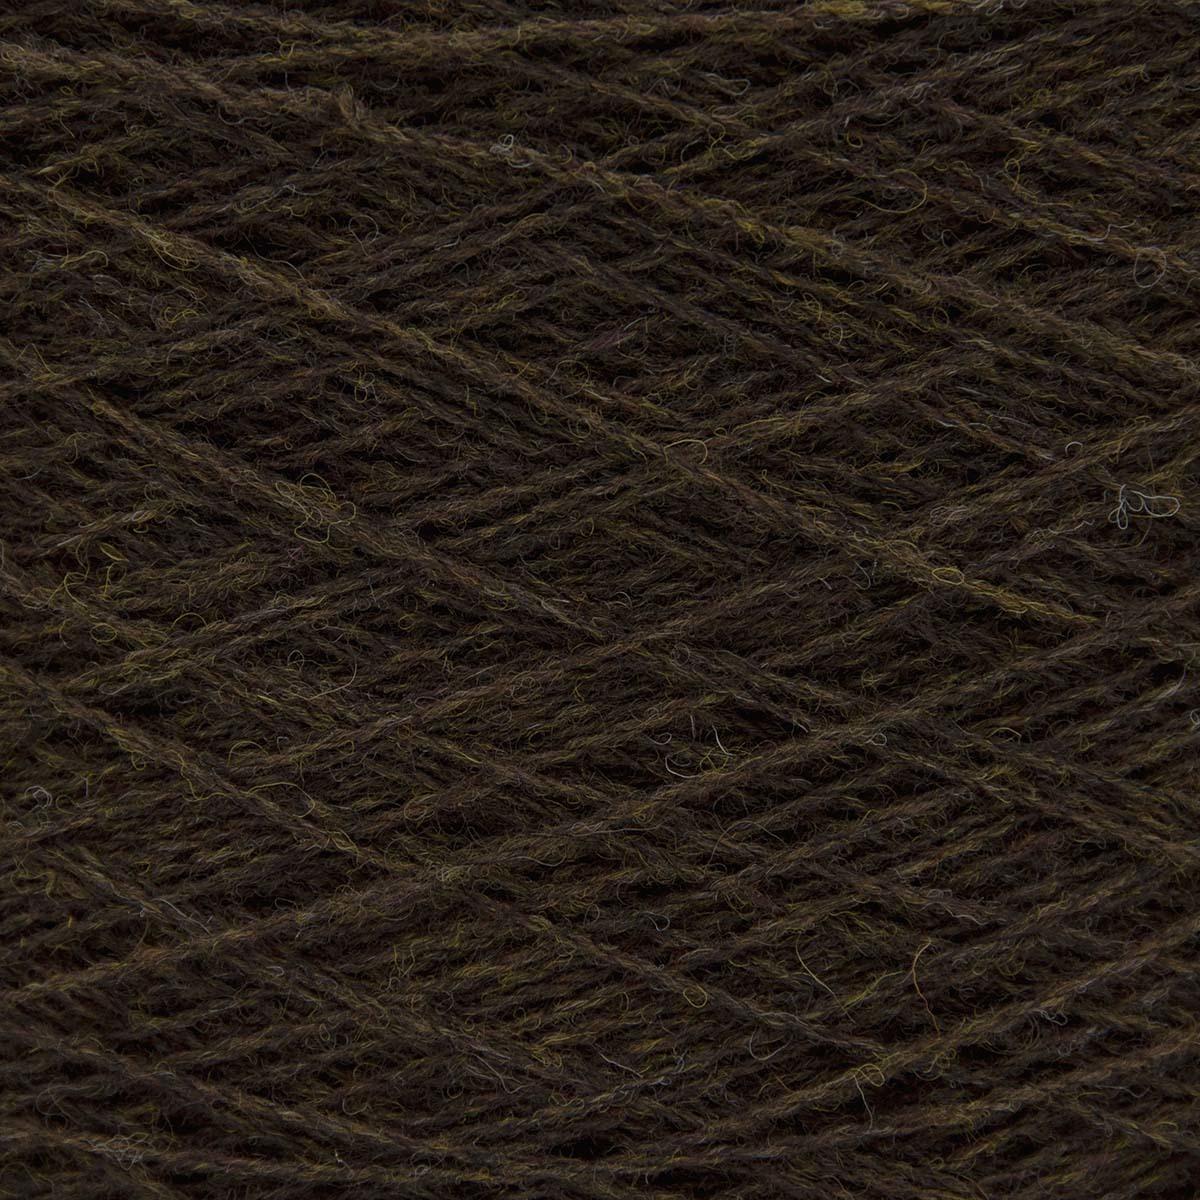 Knoll Yarns Shetland - 165